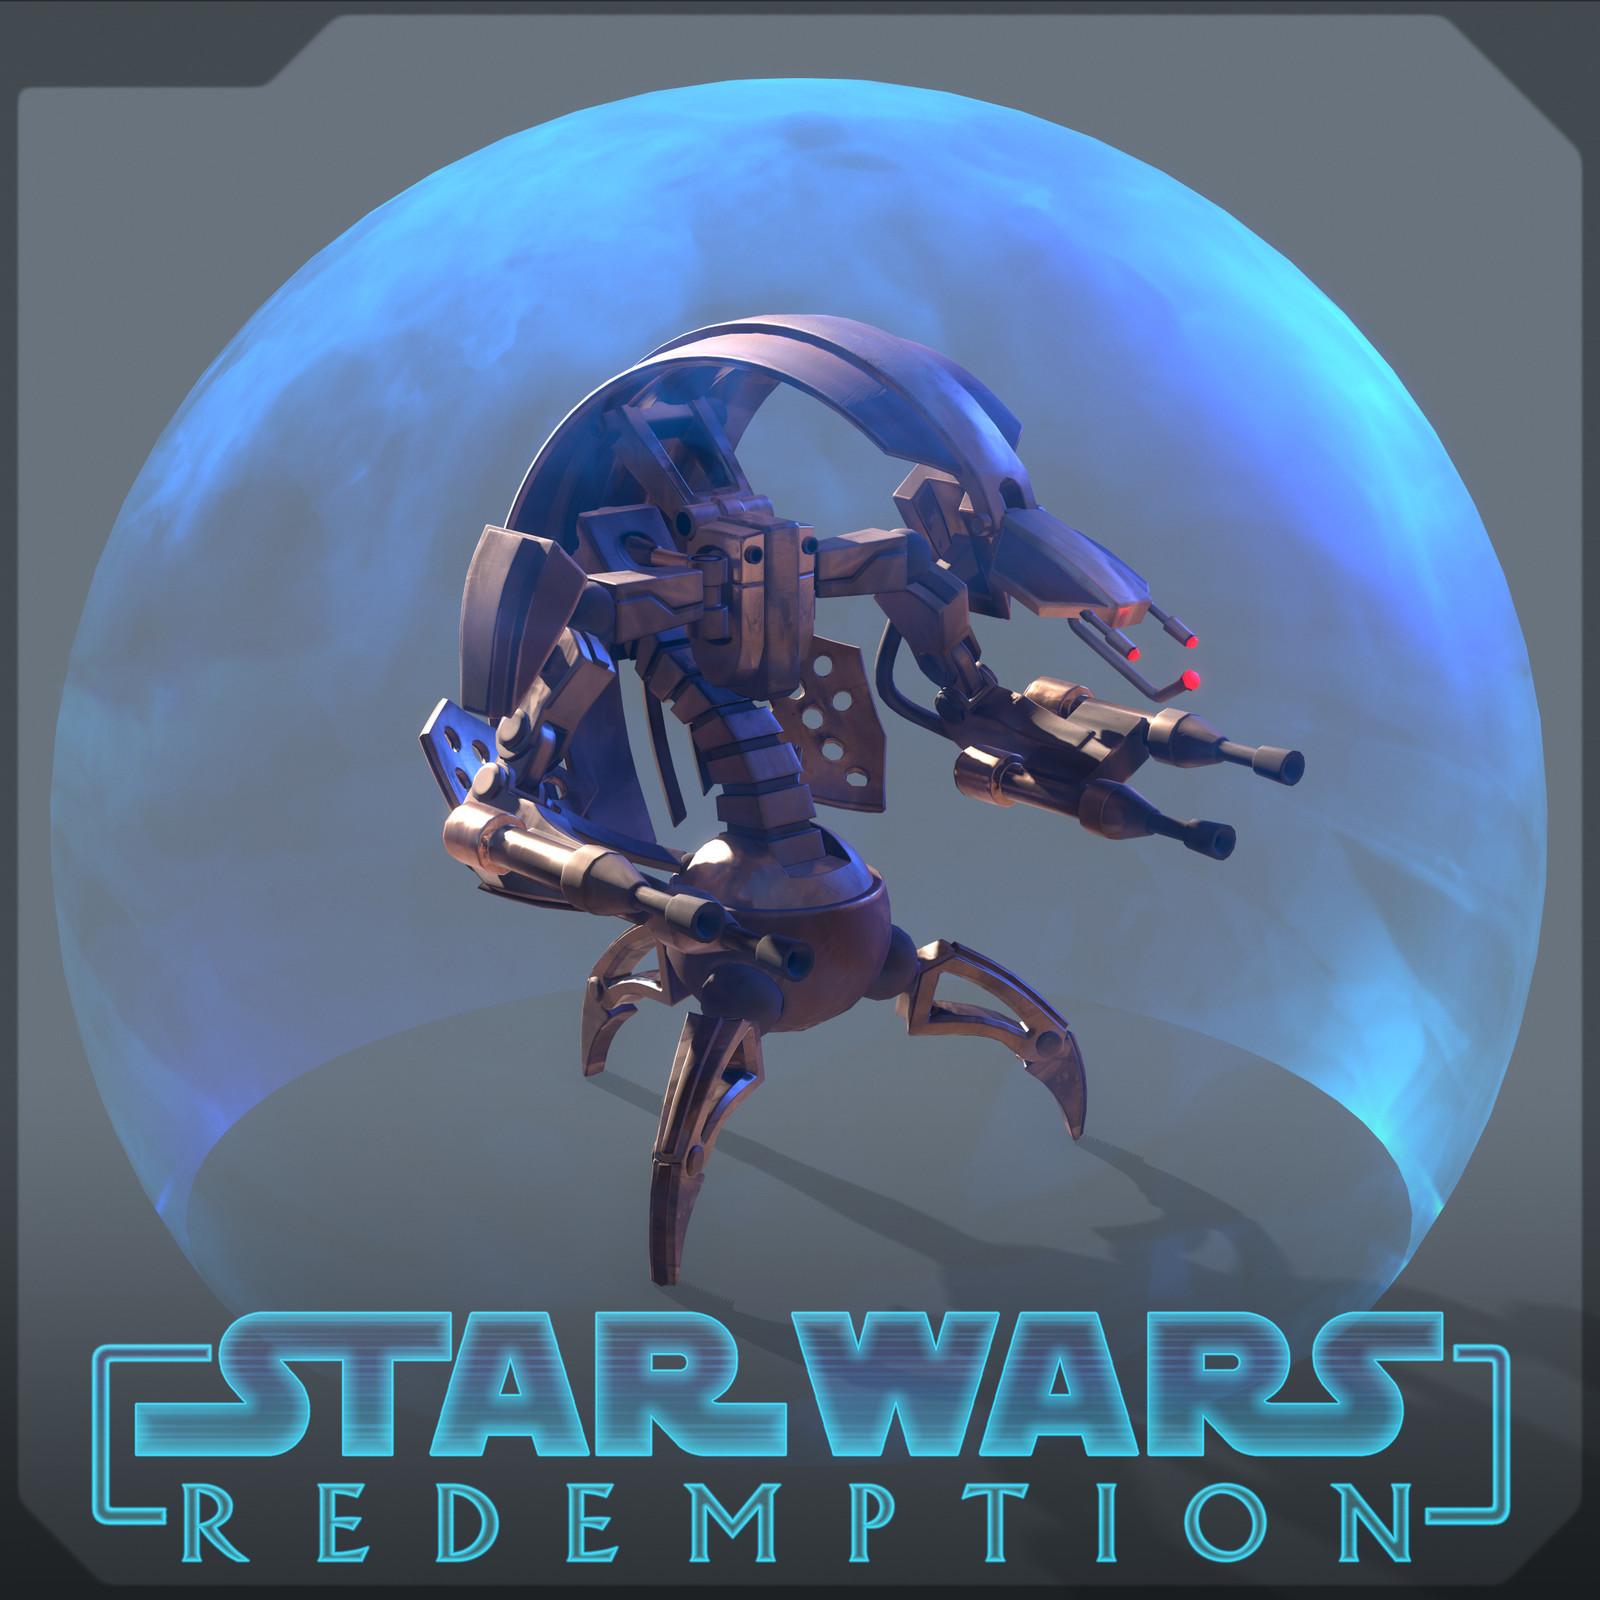 Star Wars - Redemption | CIS Droideka